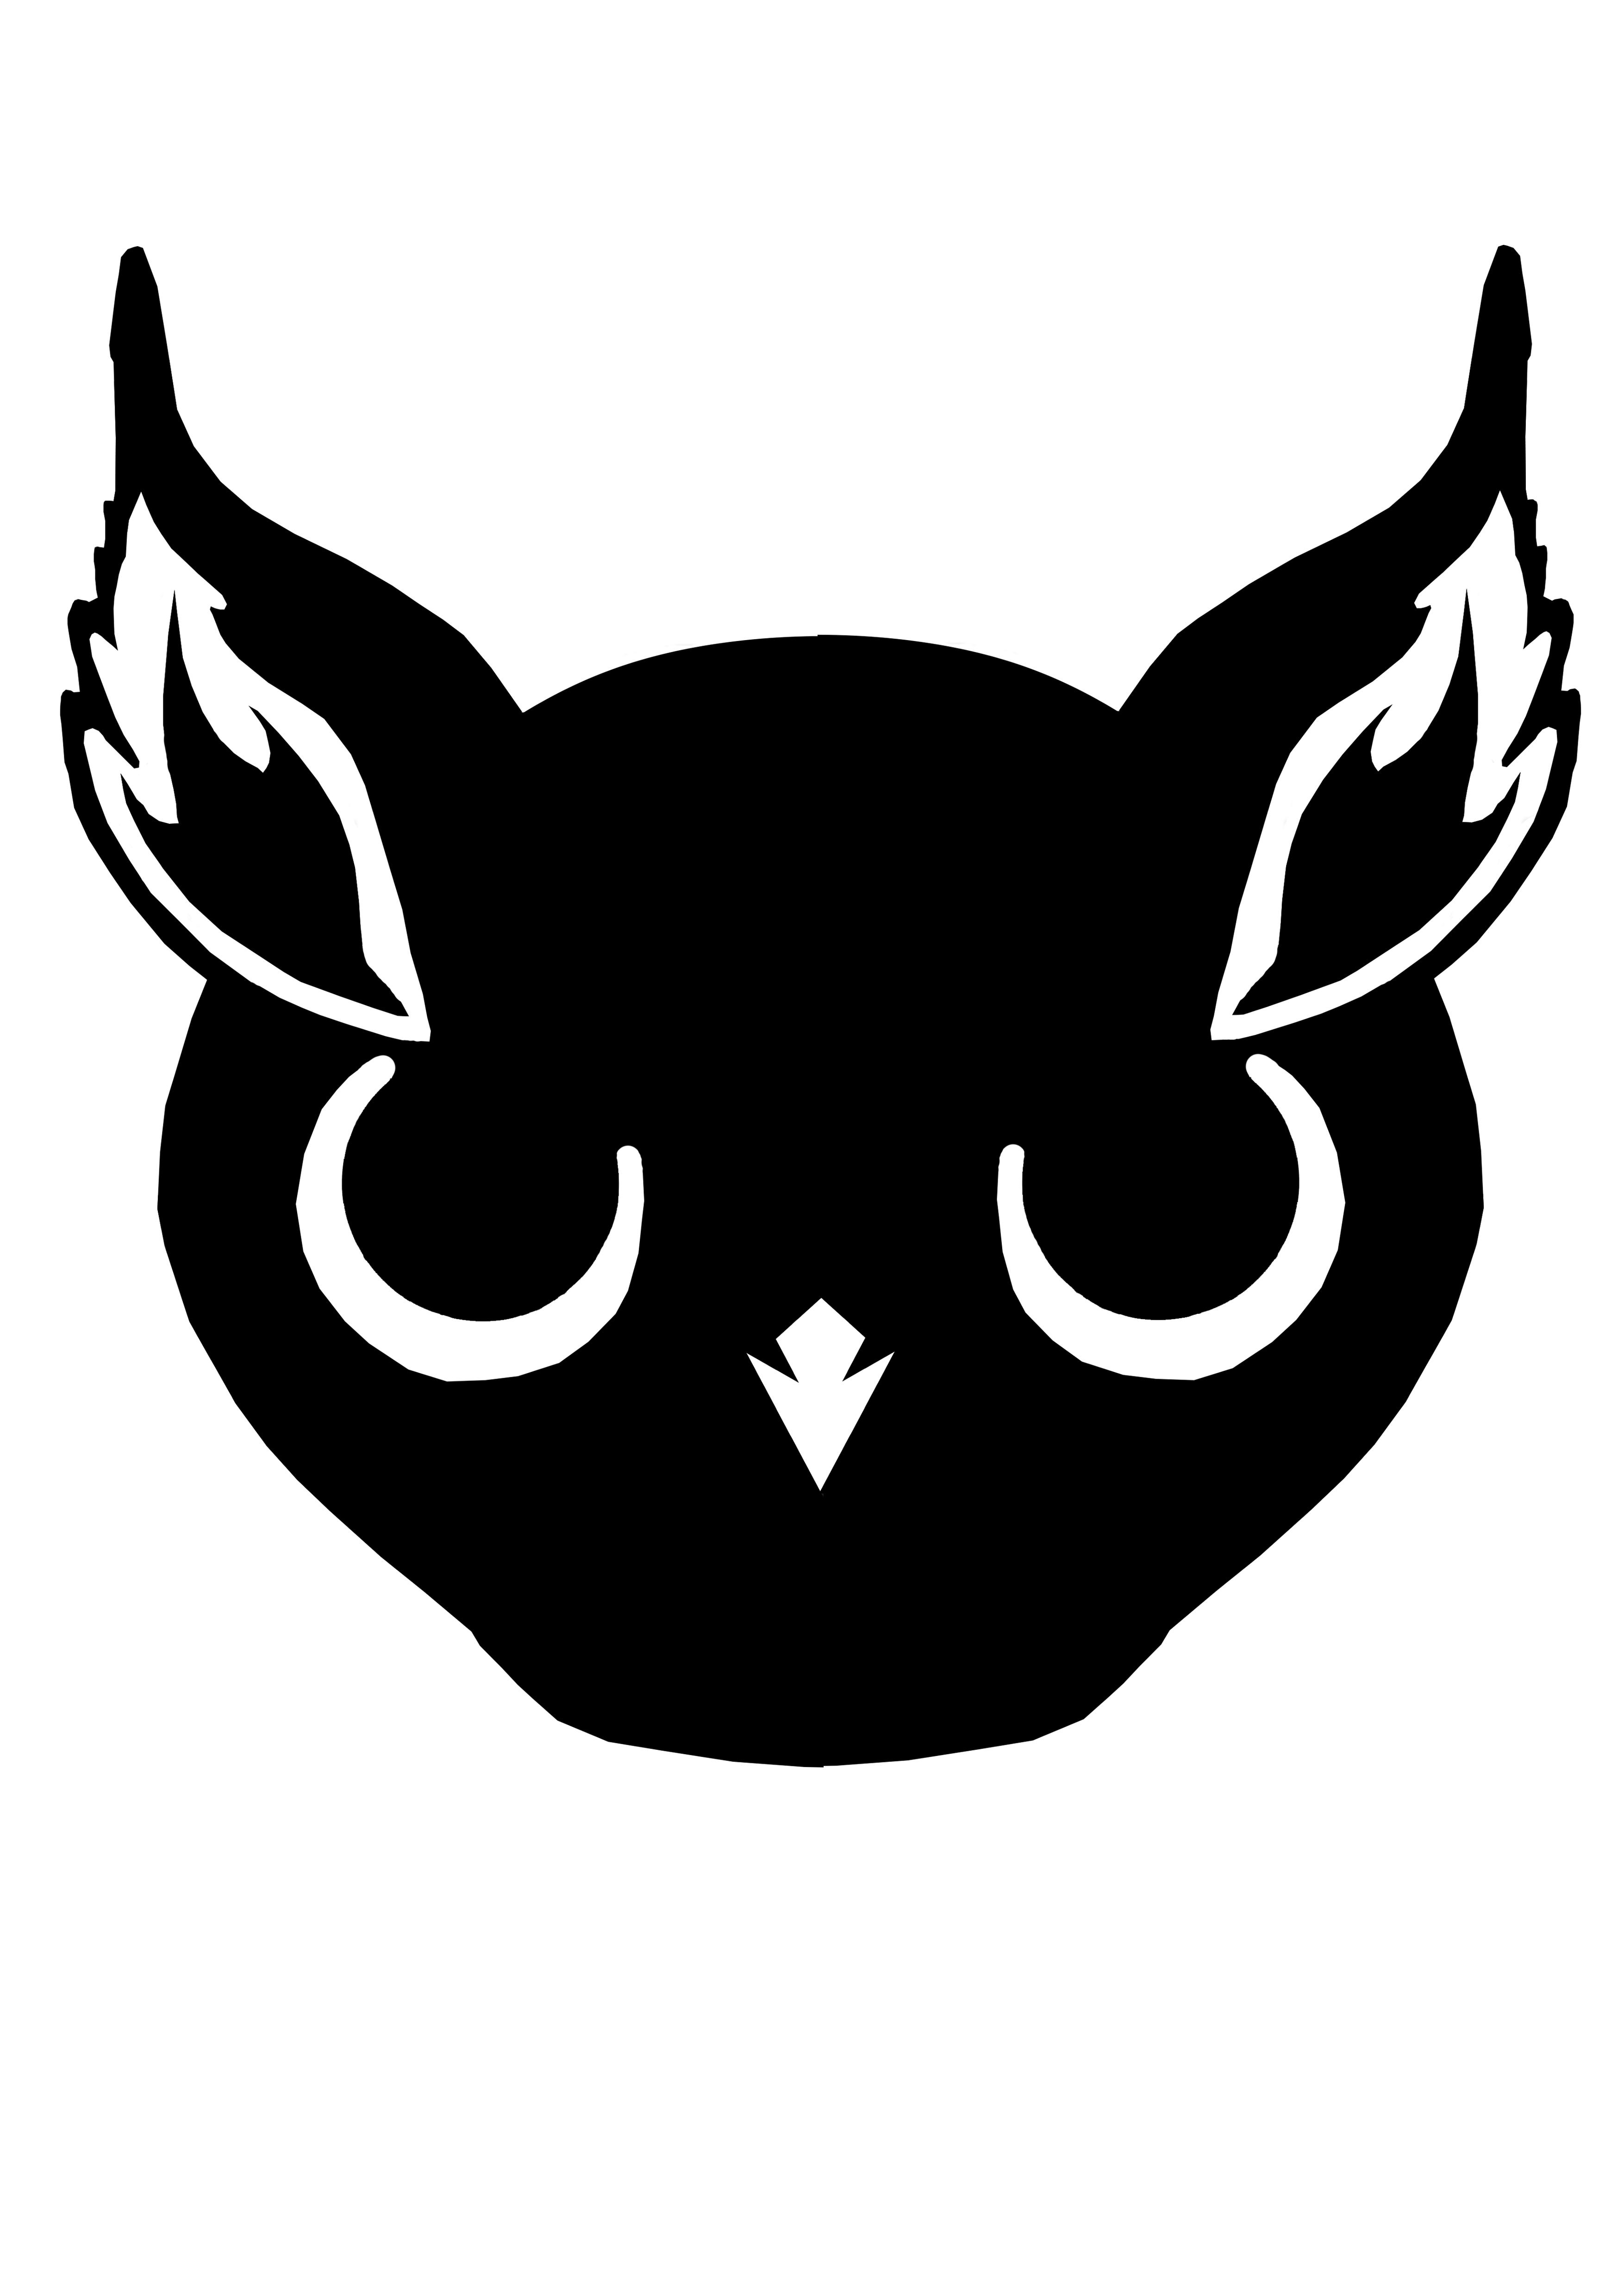 OWL RIDE